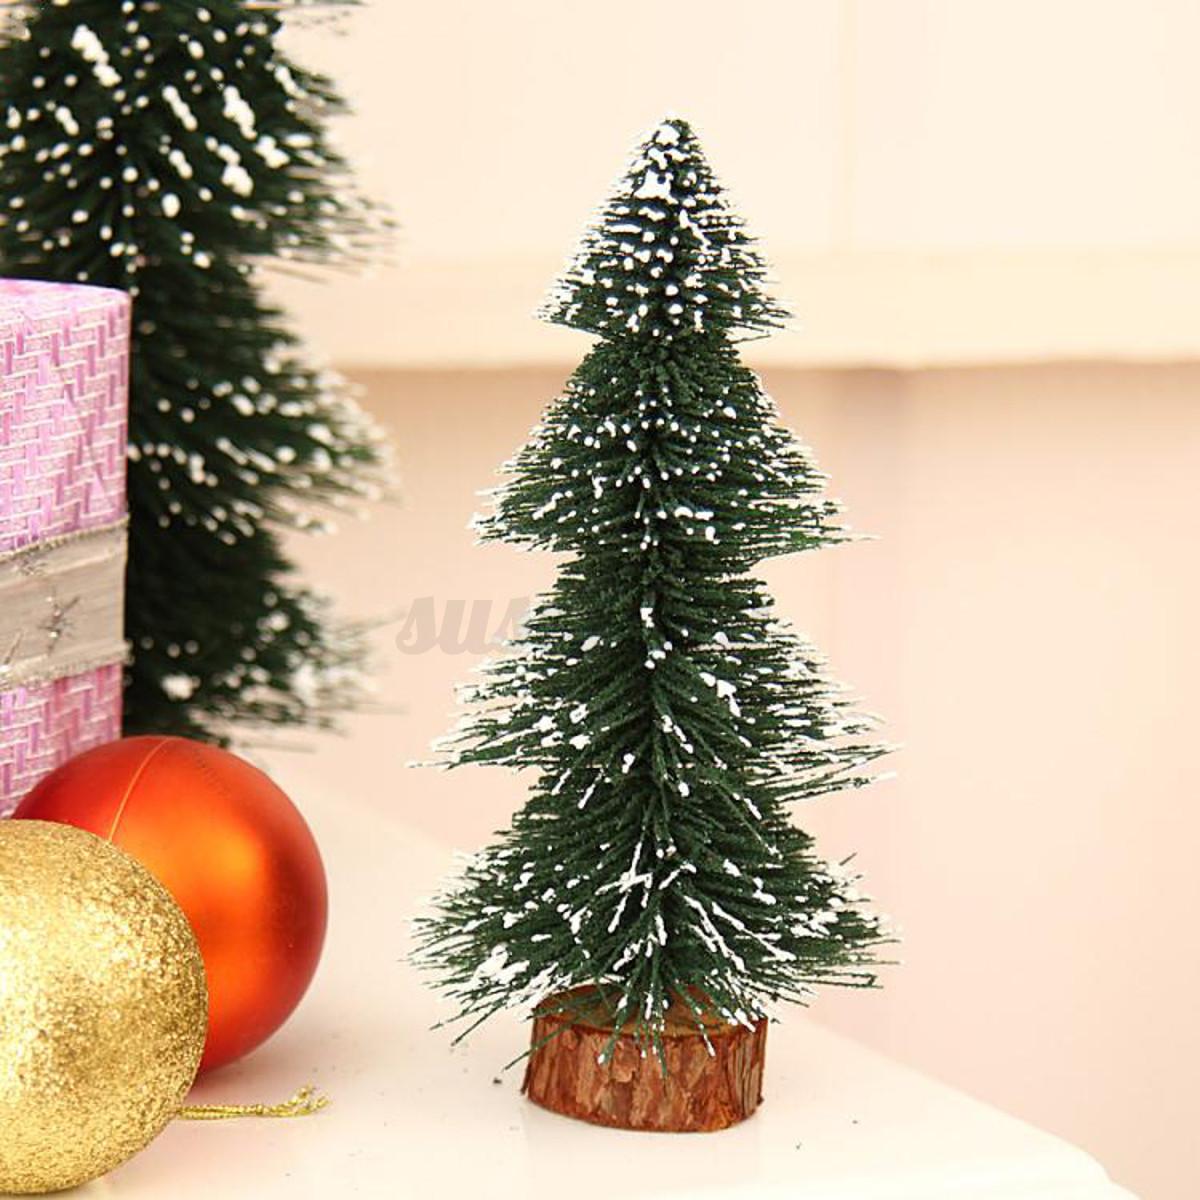 Mini Christmas Pine Tree Festival Party Ornaments Xmas